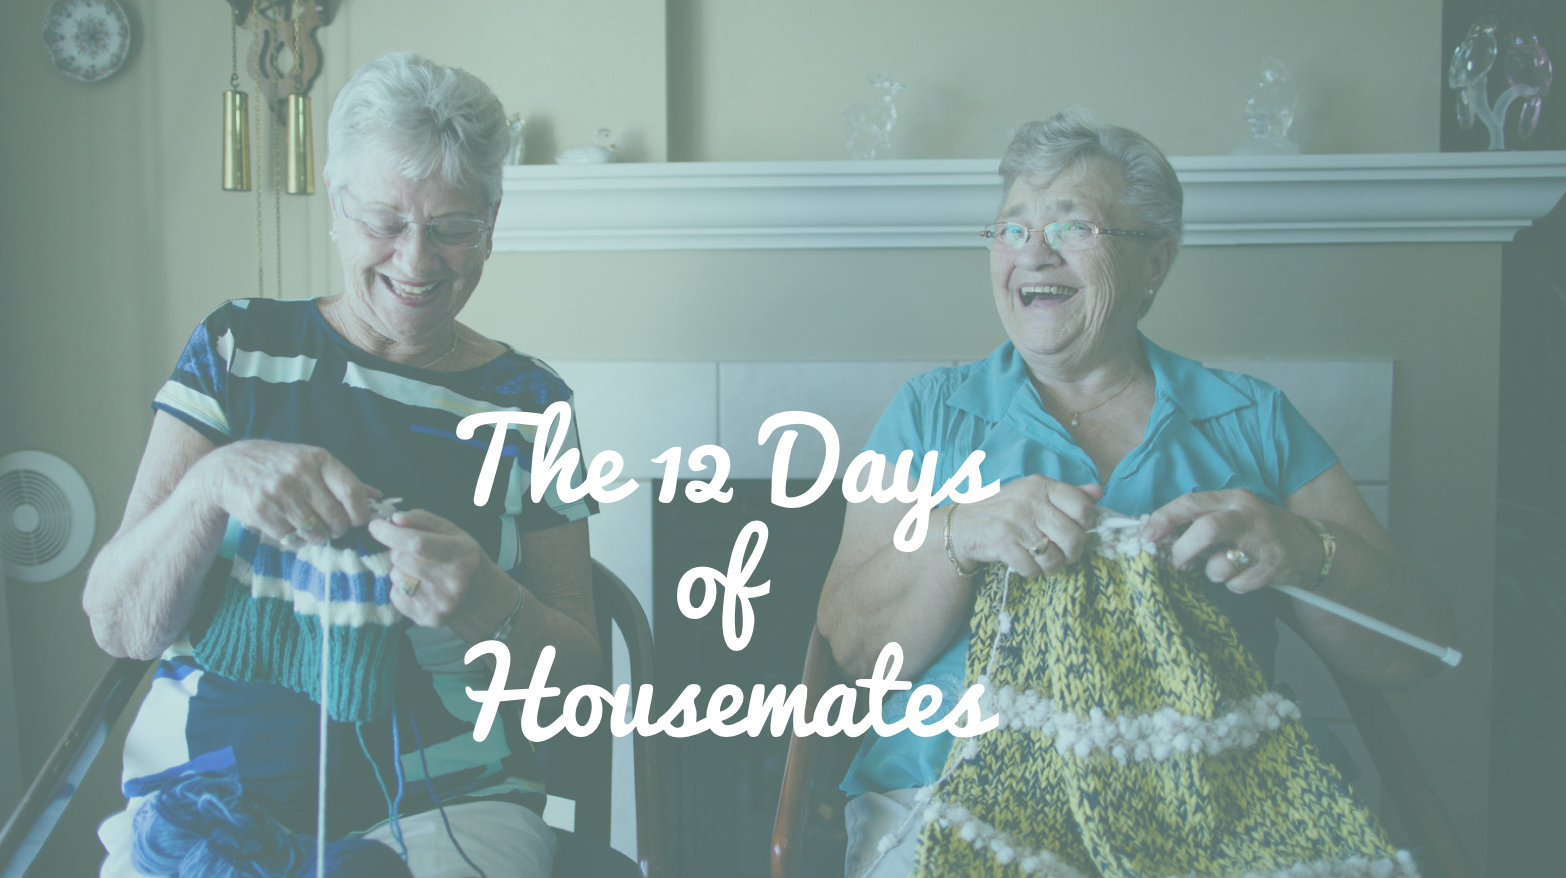 12 Days of Housemates